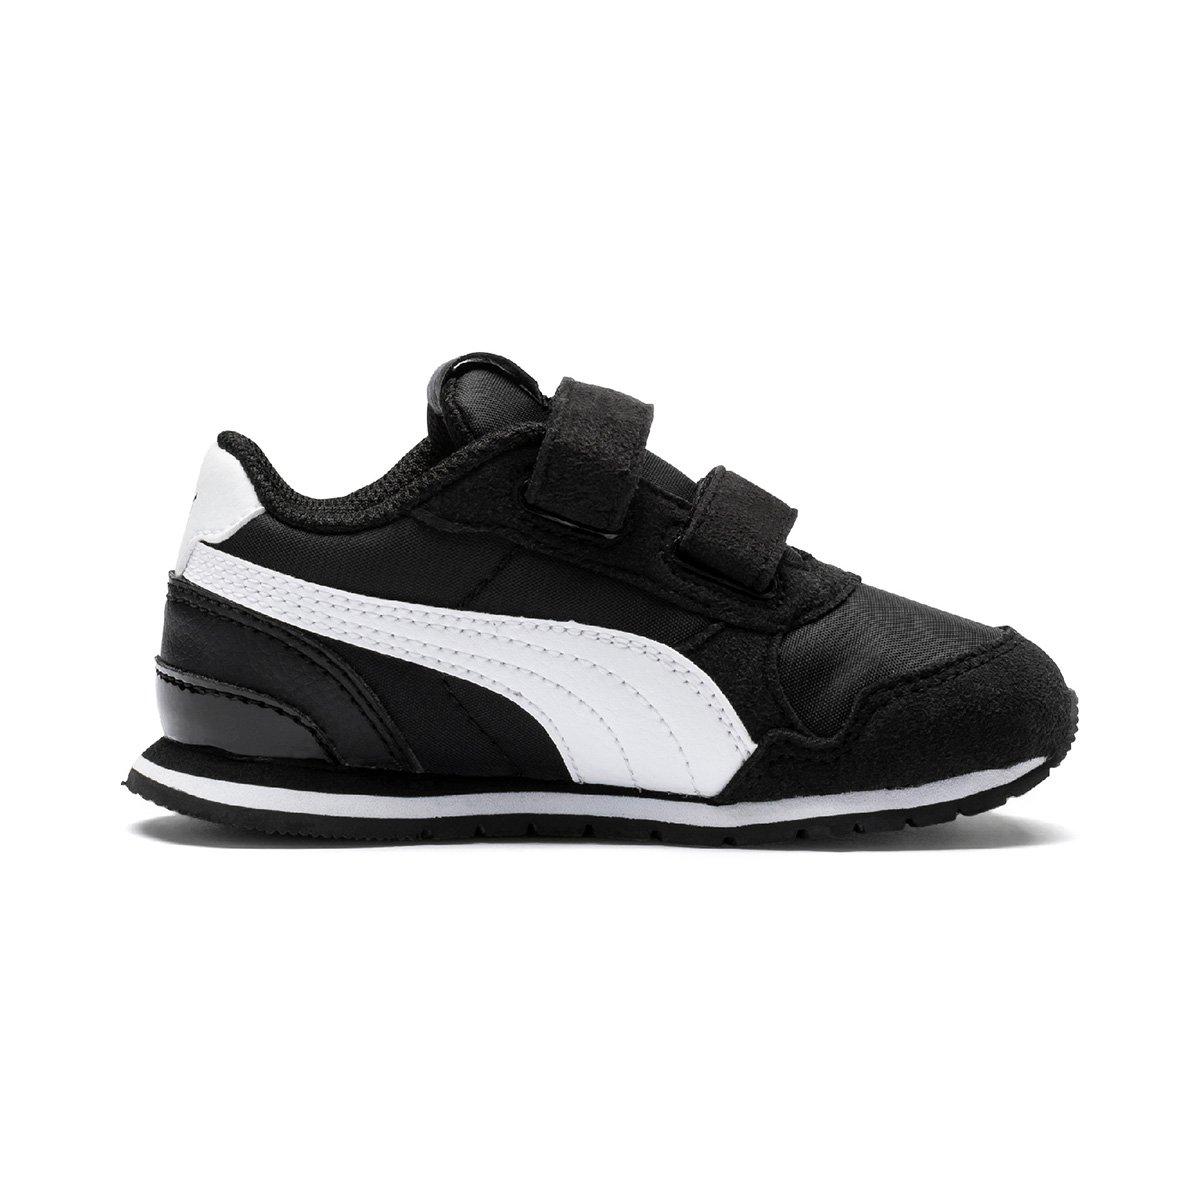 Tênis Infantil Puma St Runner V2 Nl V Ps - Compre Agora  05c1059656922